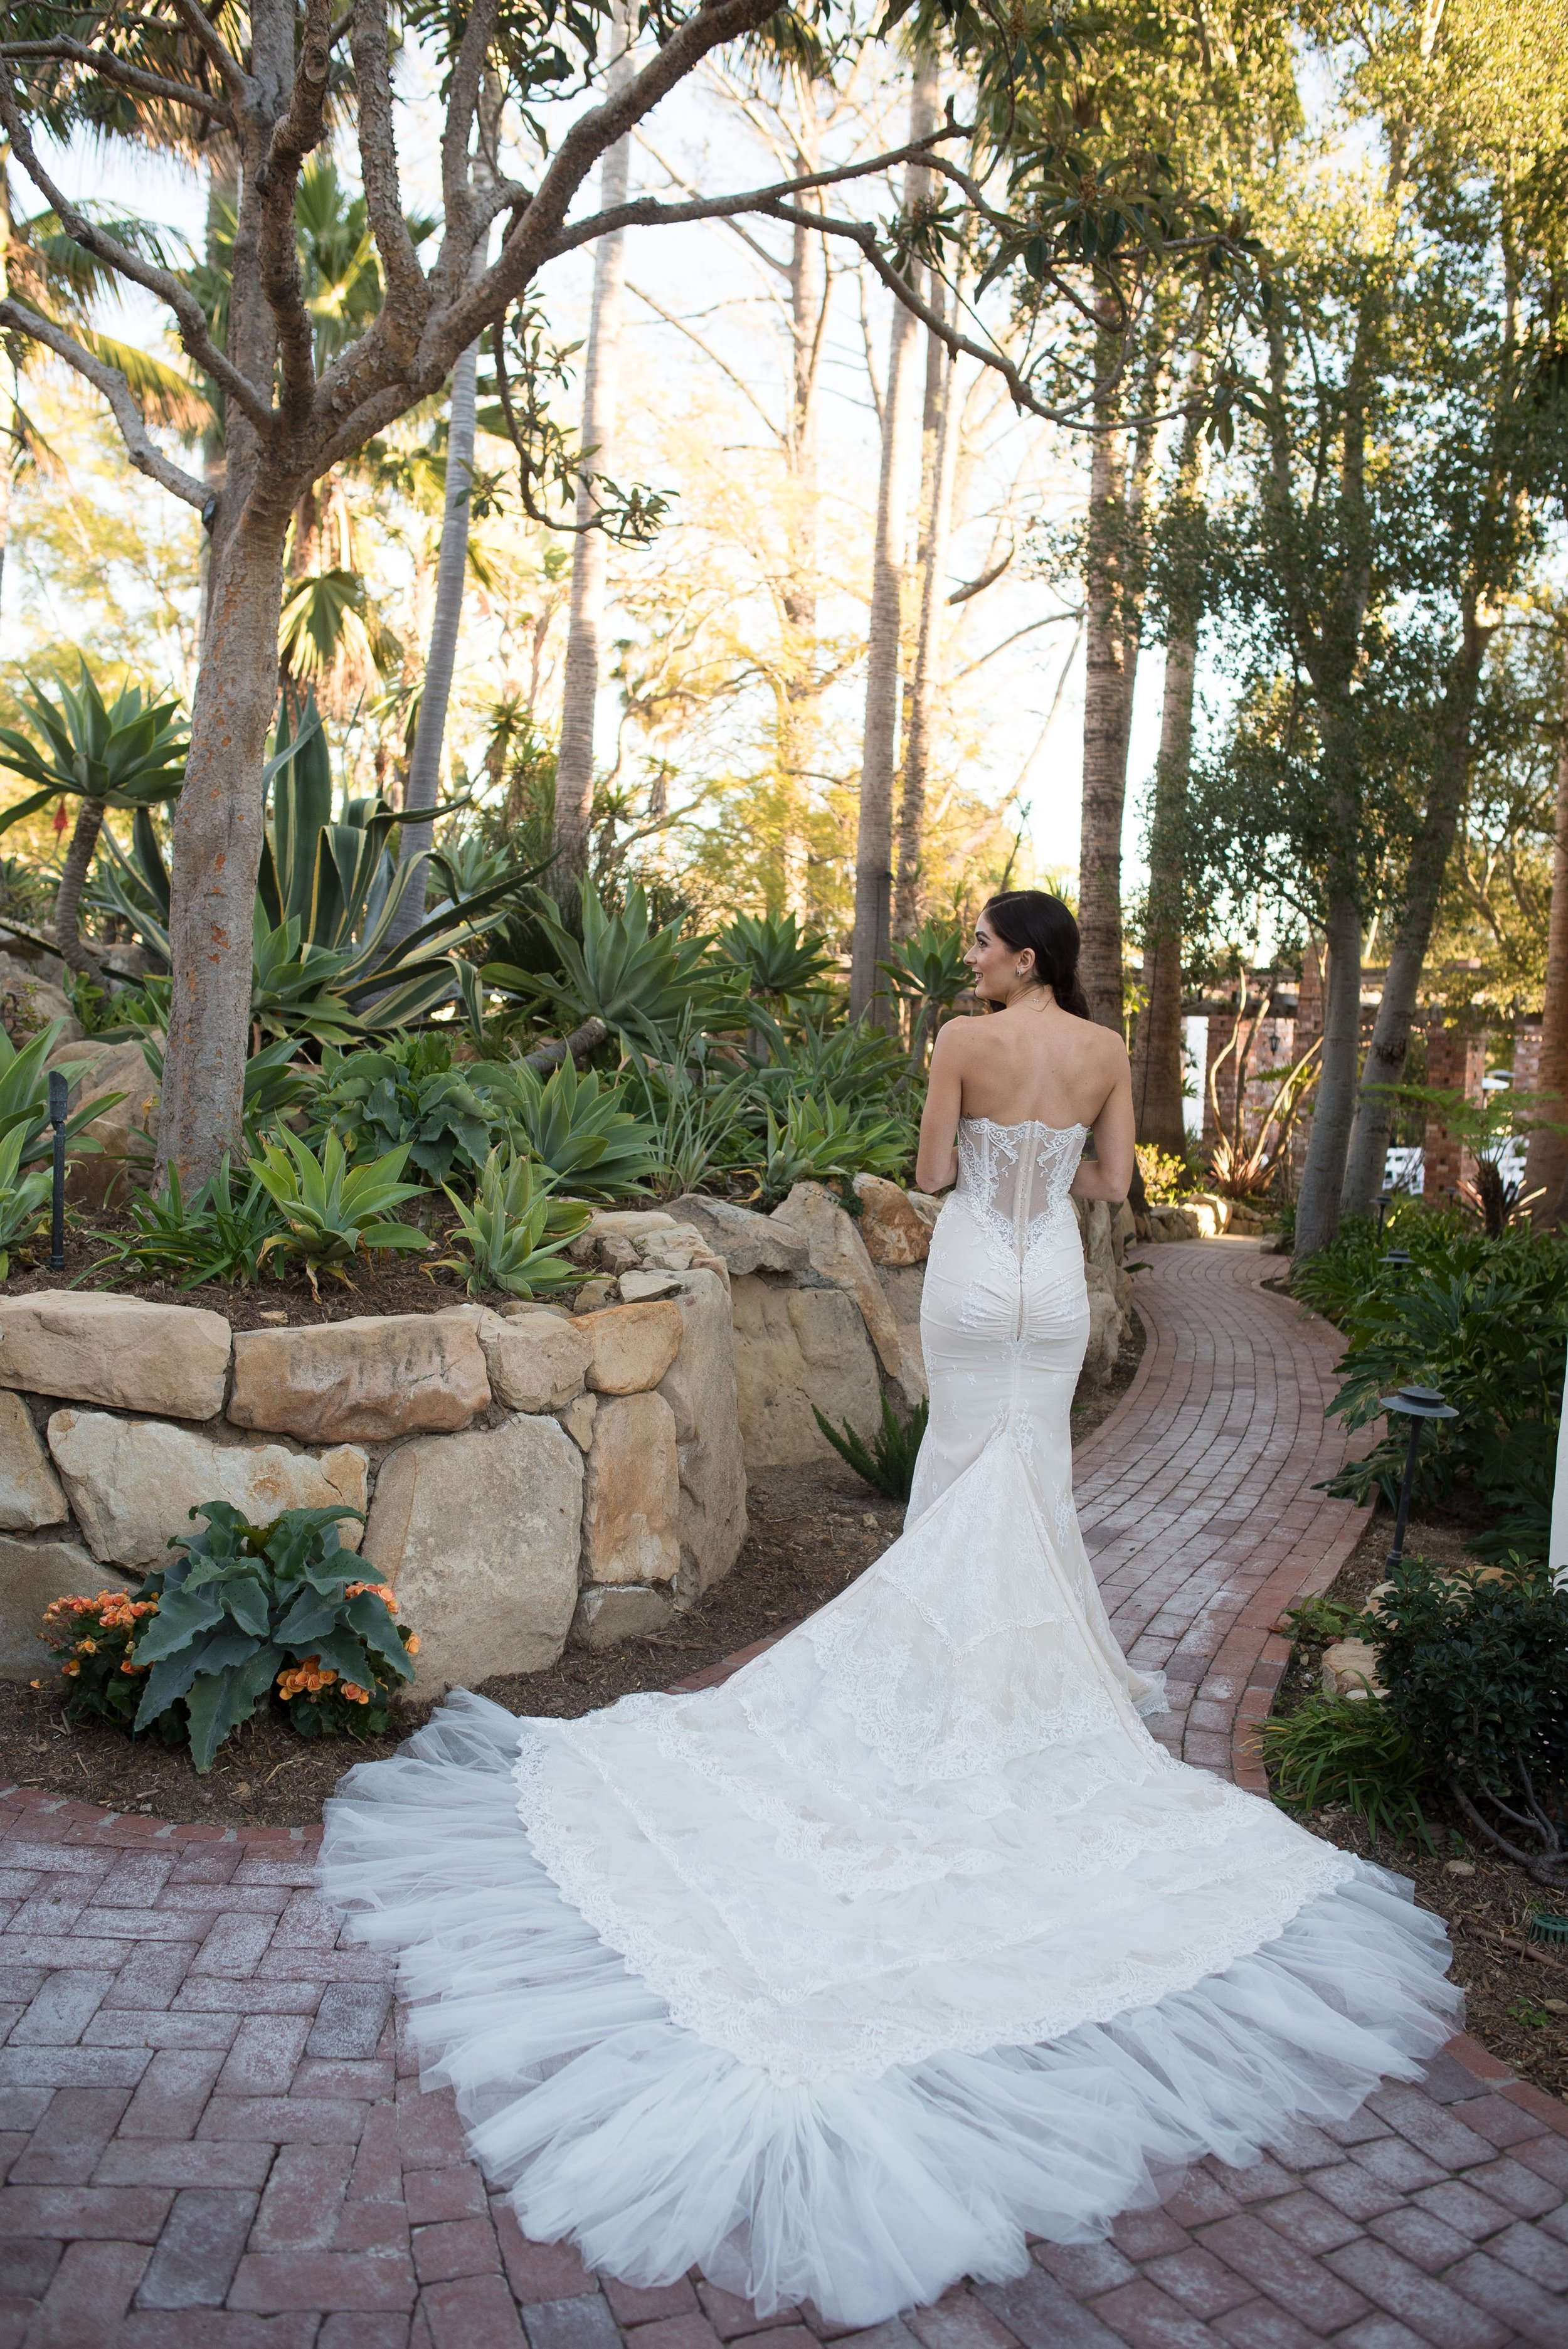 www.santabarbaraweddingstyle.com | Santa Barbara Wedding Style | Precious and Blooming | El Encanto Wedding | Nate and Jenny Weddings | Bride in Wedding Dress